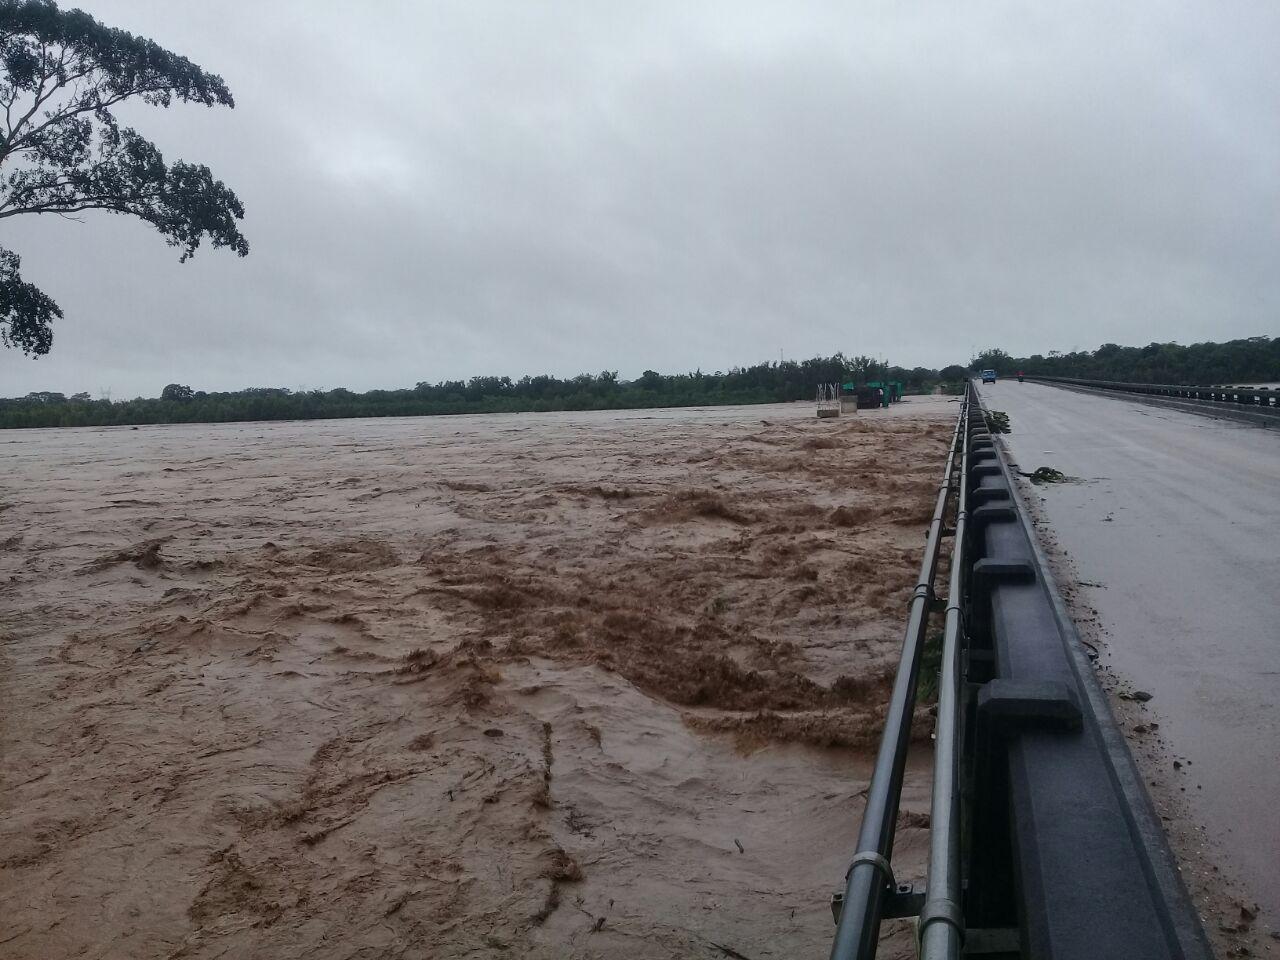 Gobernación aguarda que bajen las aguas para enviar ayuda a familias afectadas por las lluvias